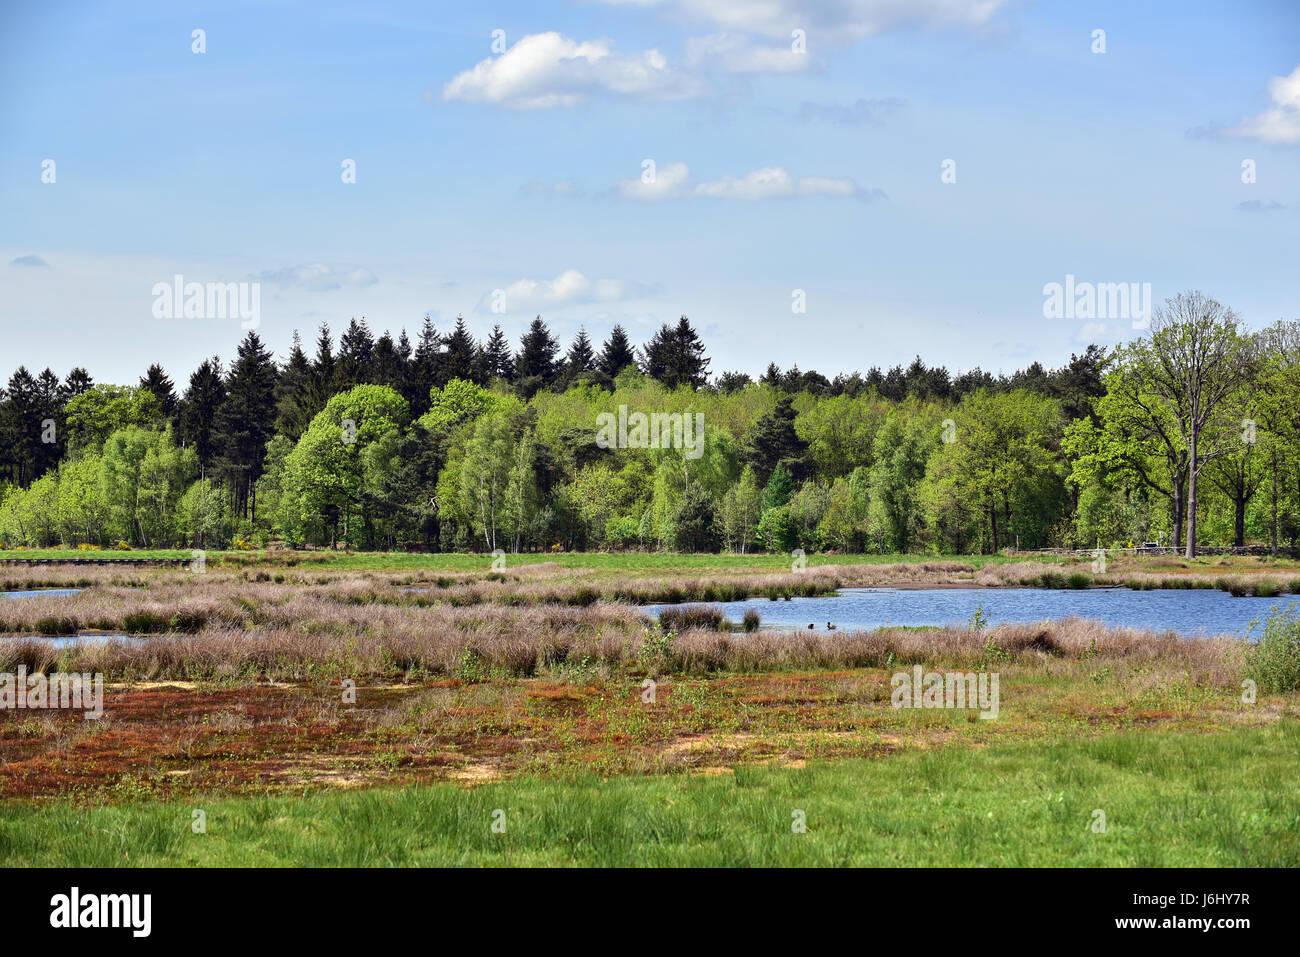 Springtime on Dwingelderveld National Park, Drenthe, The Netherlands - Stock Image